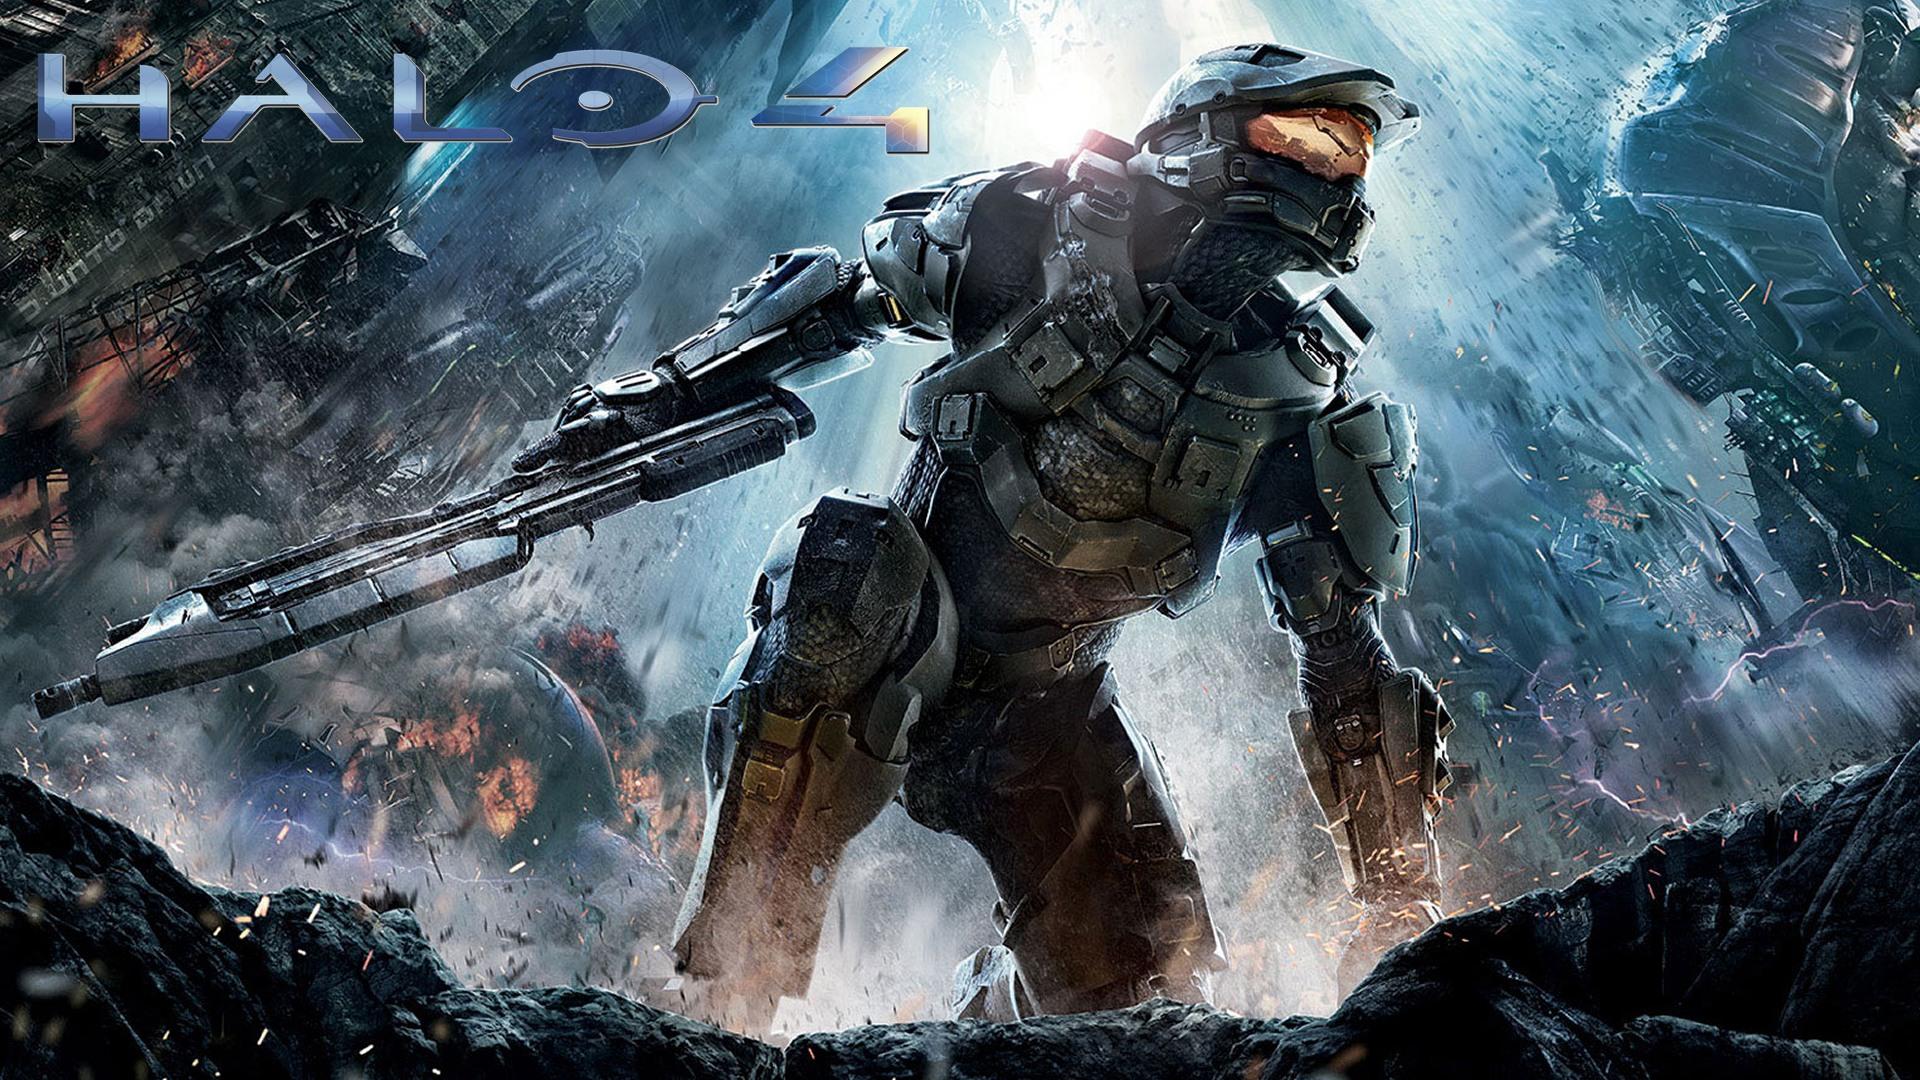 Halo 4 Wallpaper 1920x1080